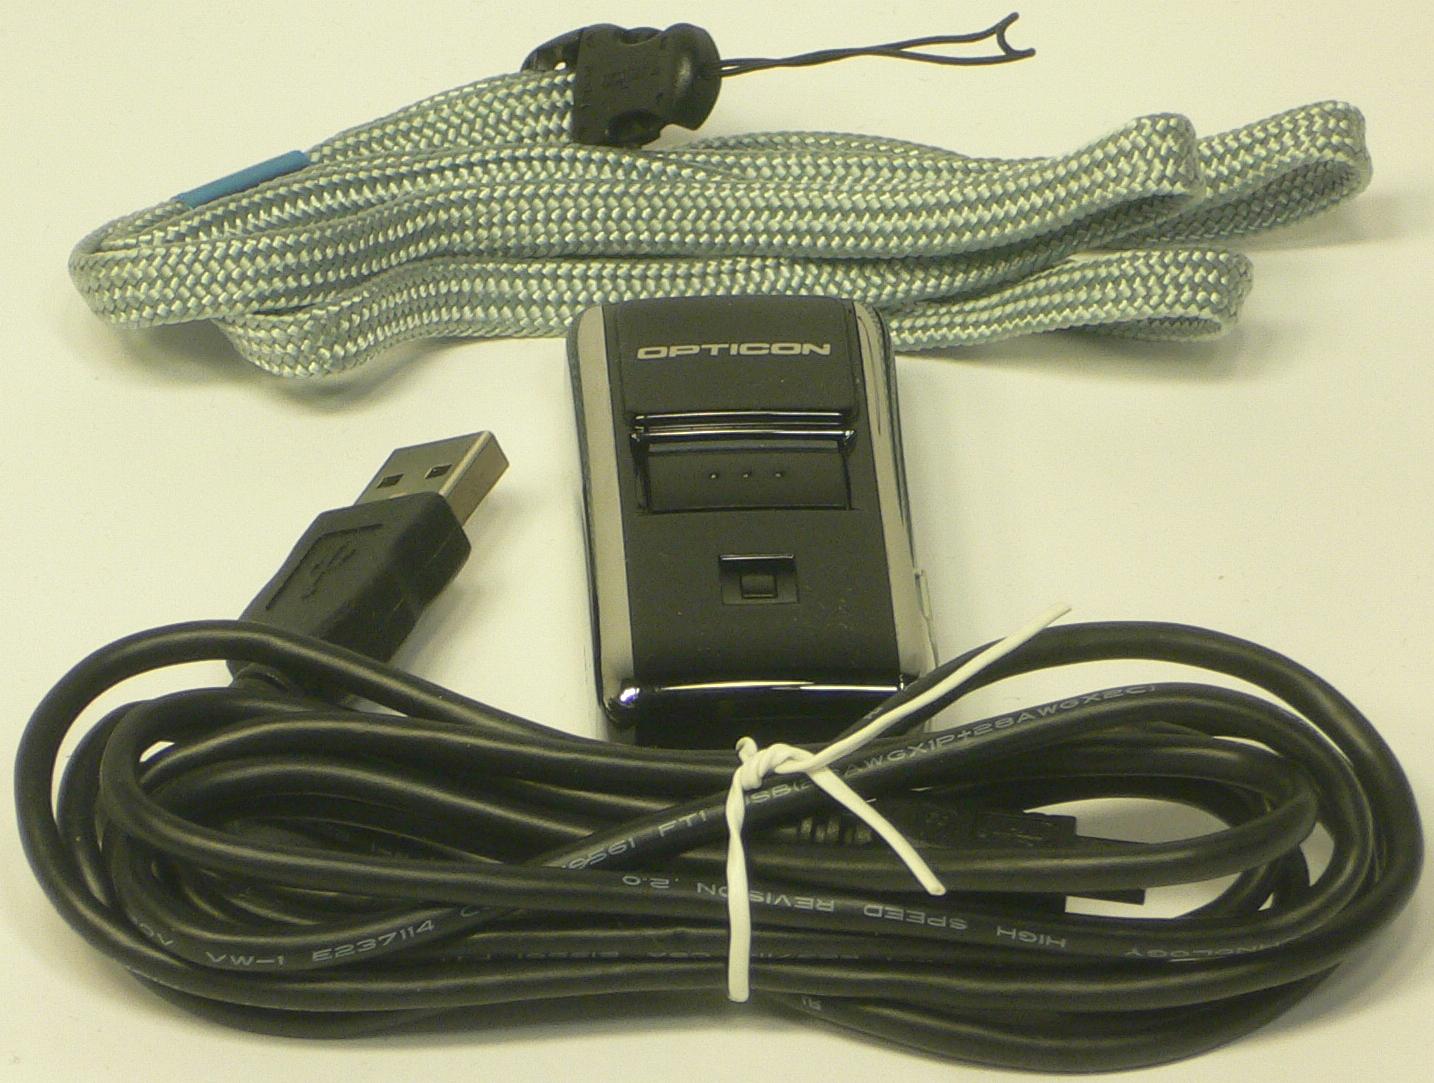 OPN2002-00 Image 1